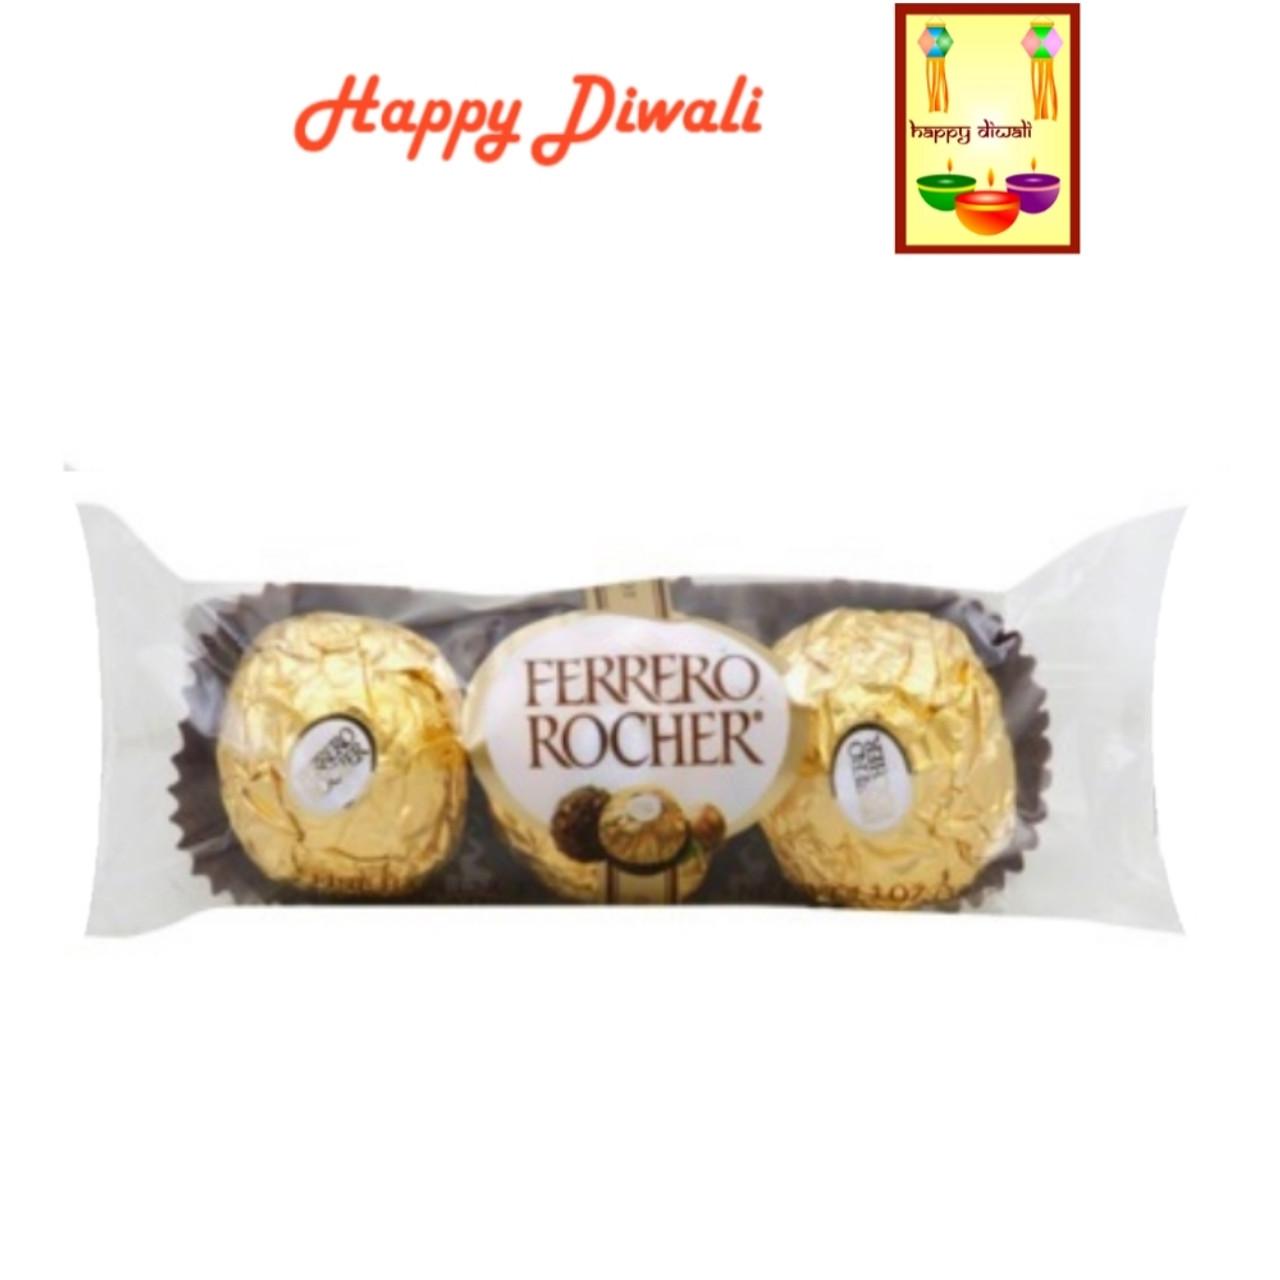 Diwali Chocolates- Ferrero Rocher Chocolates with Diwali Greeting Card